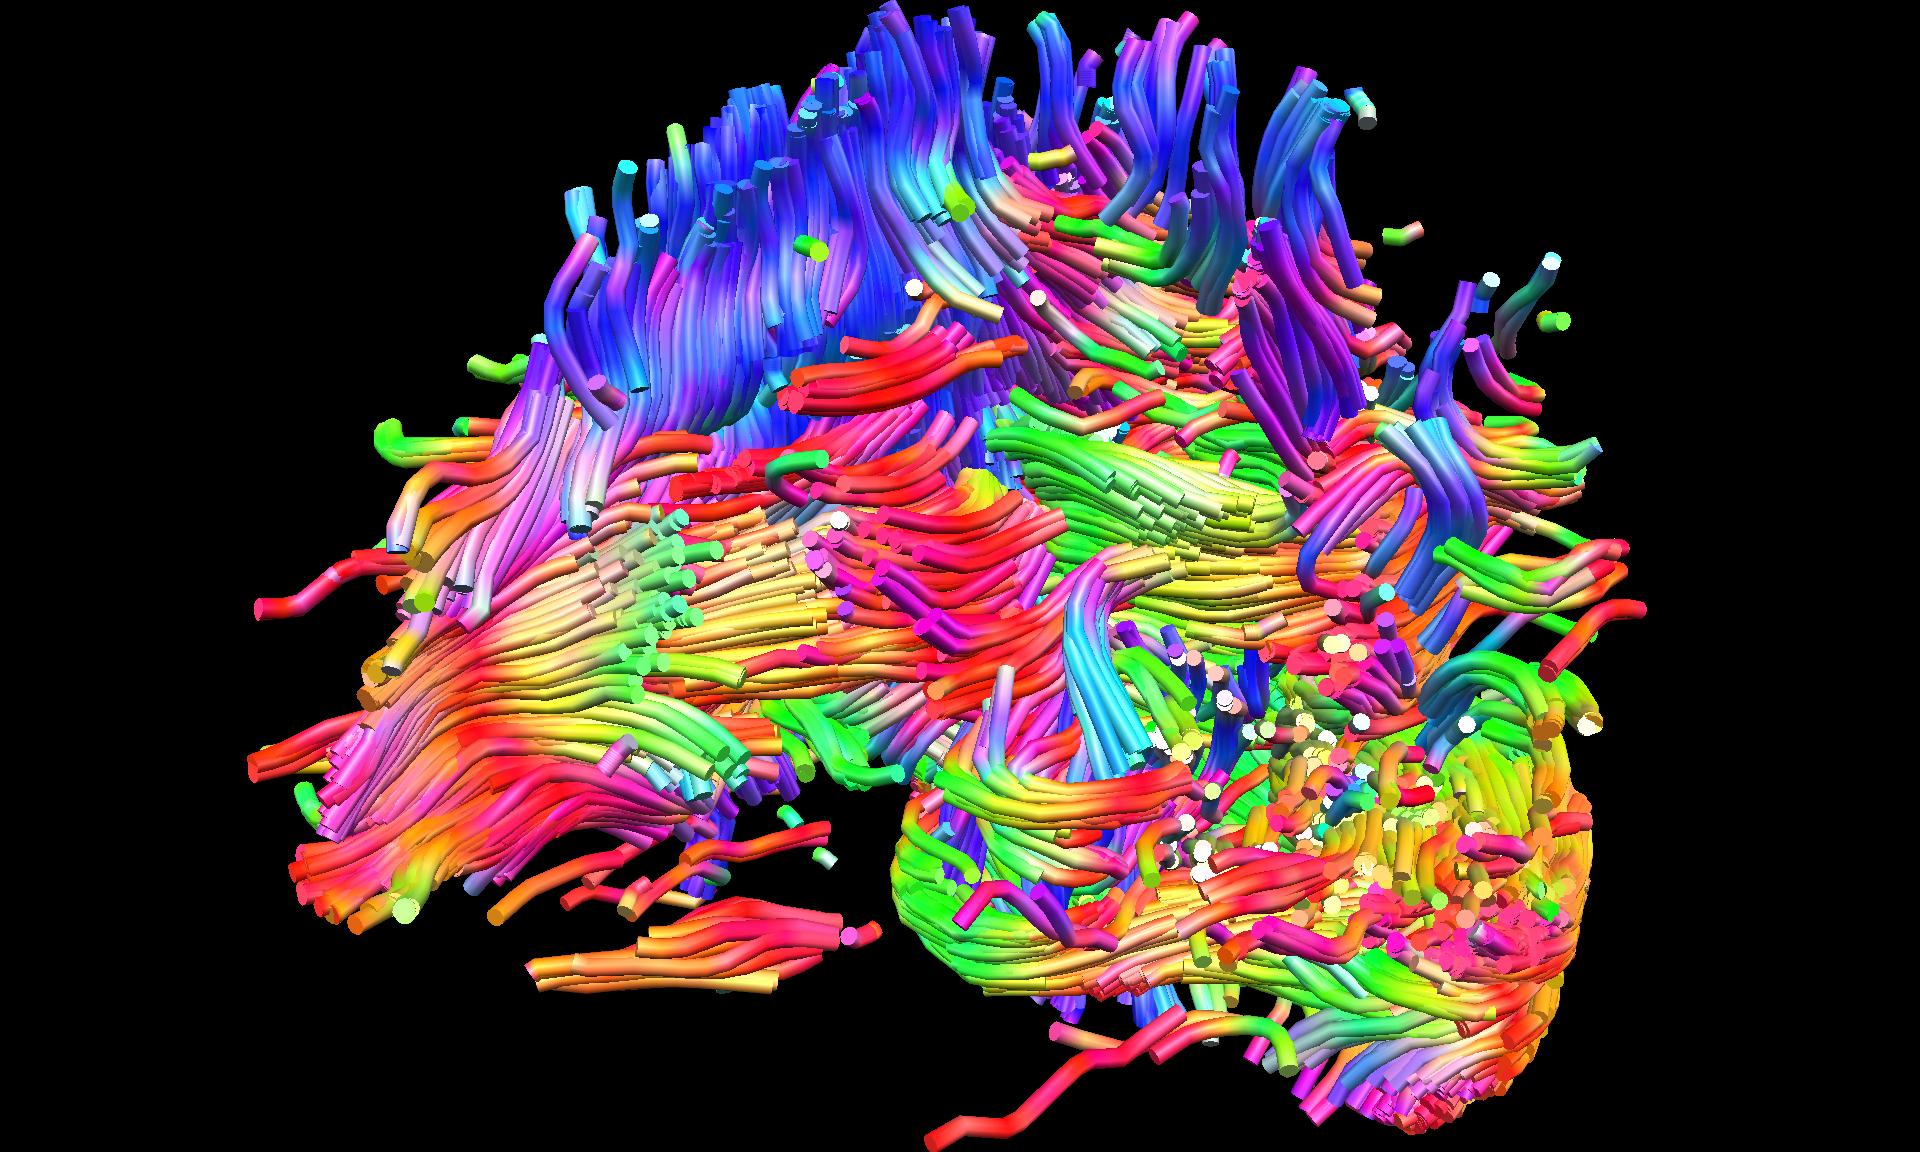 Fluid boundaries of perception - Lecture by Dr. Saskia Steinmann